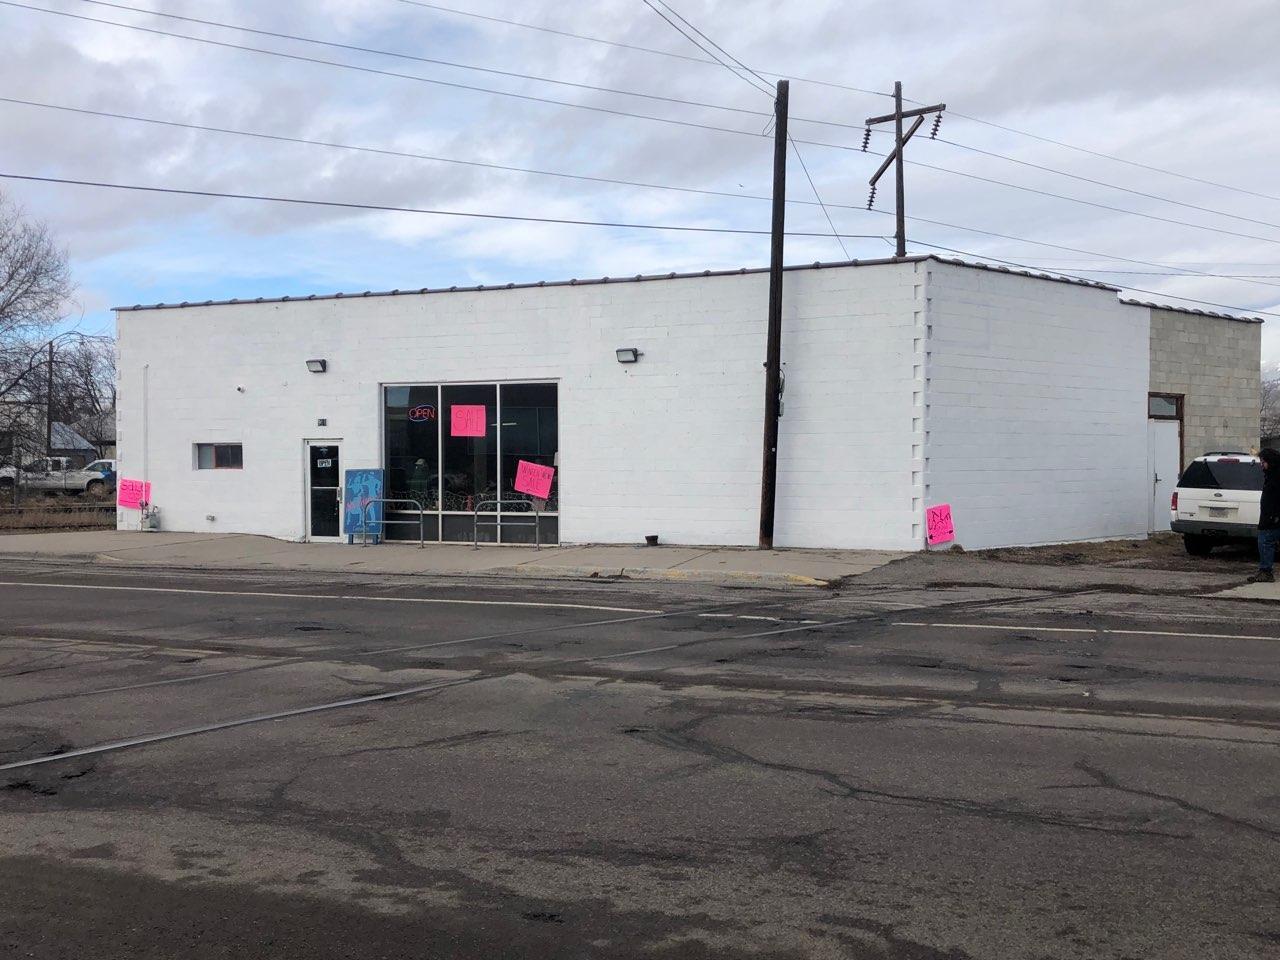 910 South 3rd Street West, Missoula, MT 59801